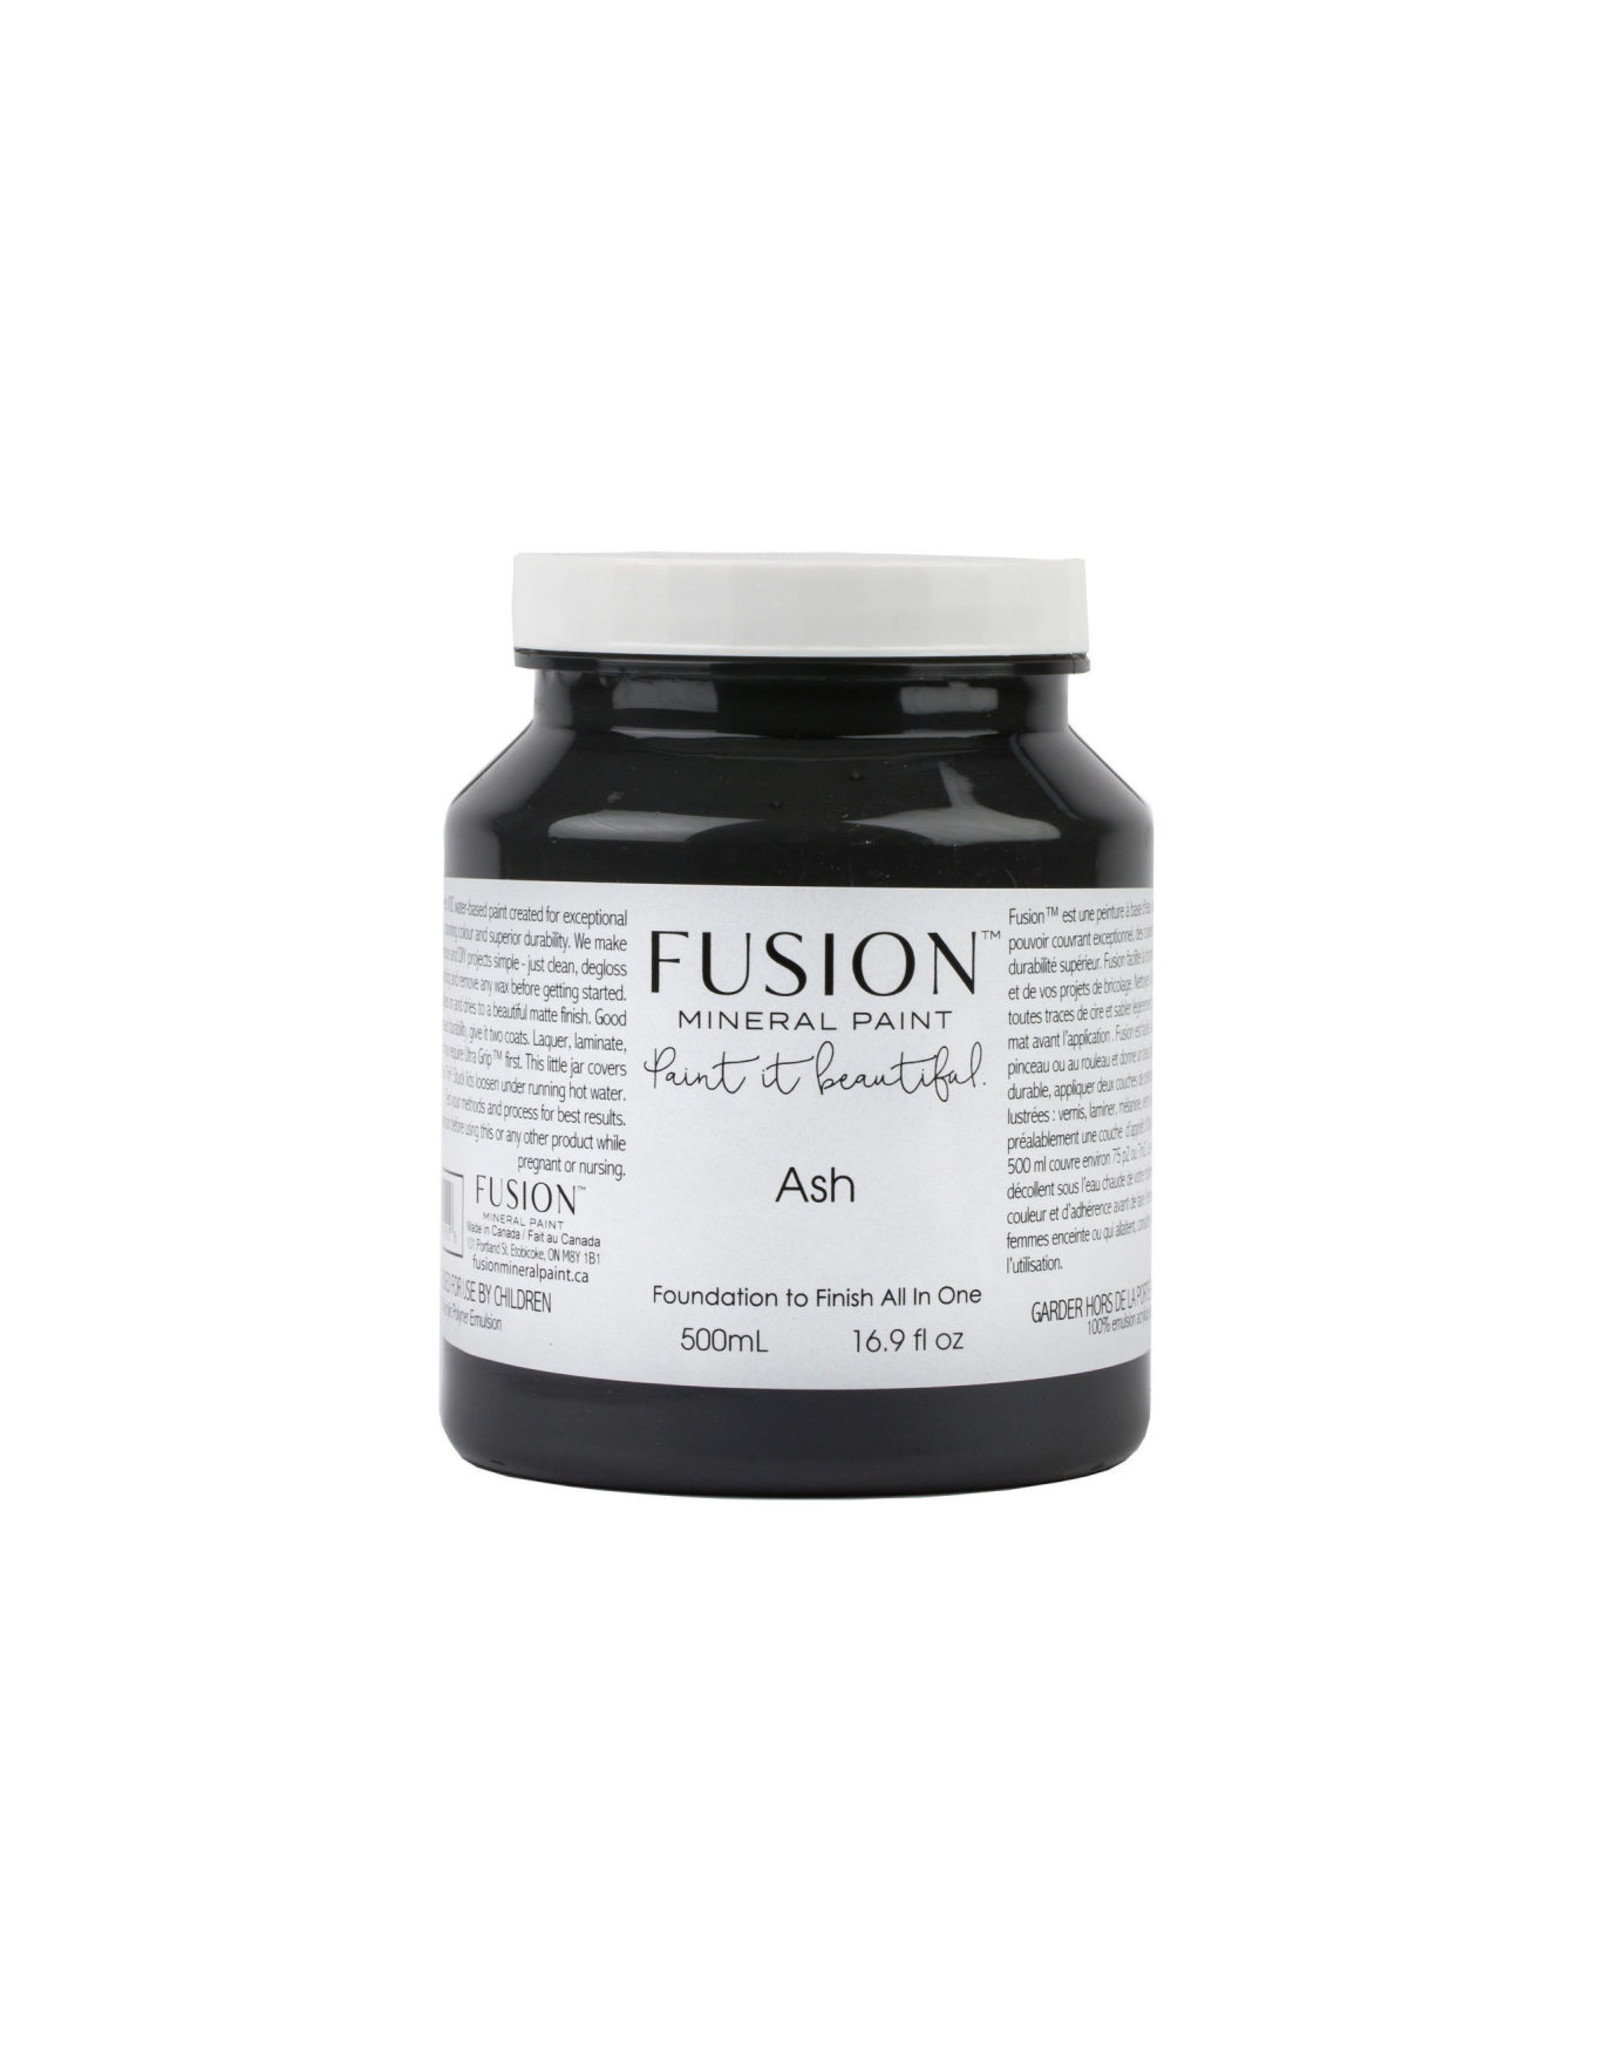 Fusion Mineral Paint Fusion Mineral Paint - Ash 500ml